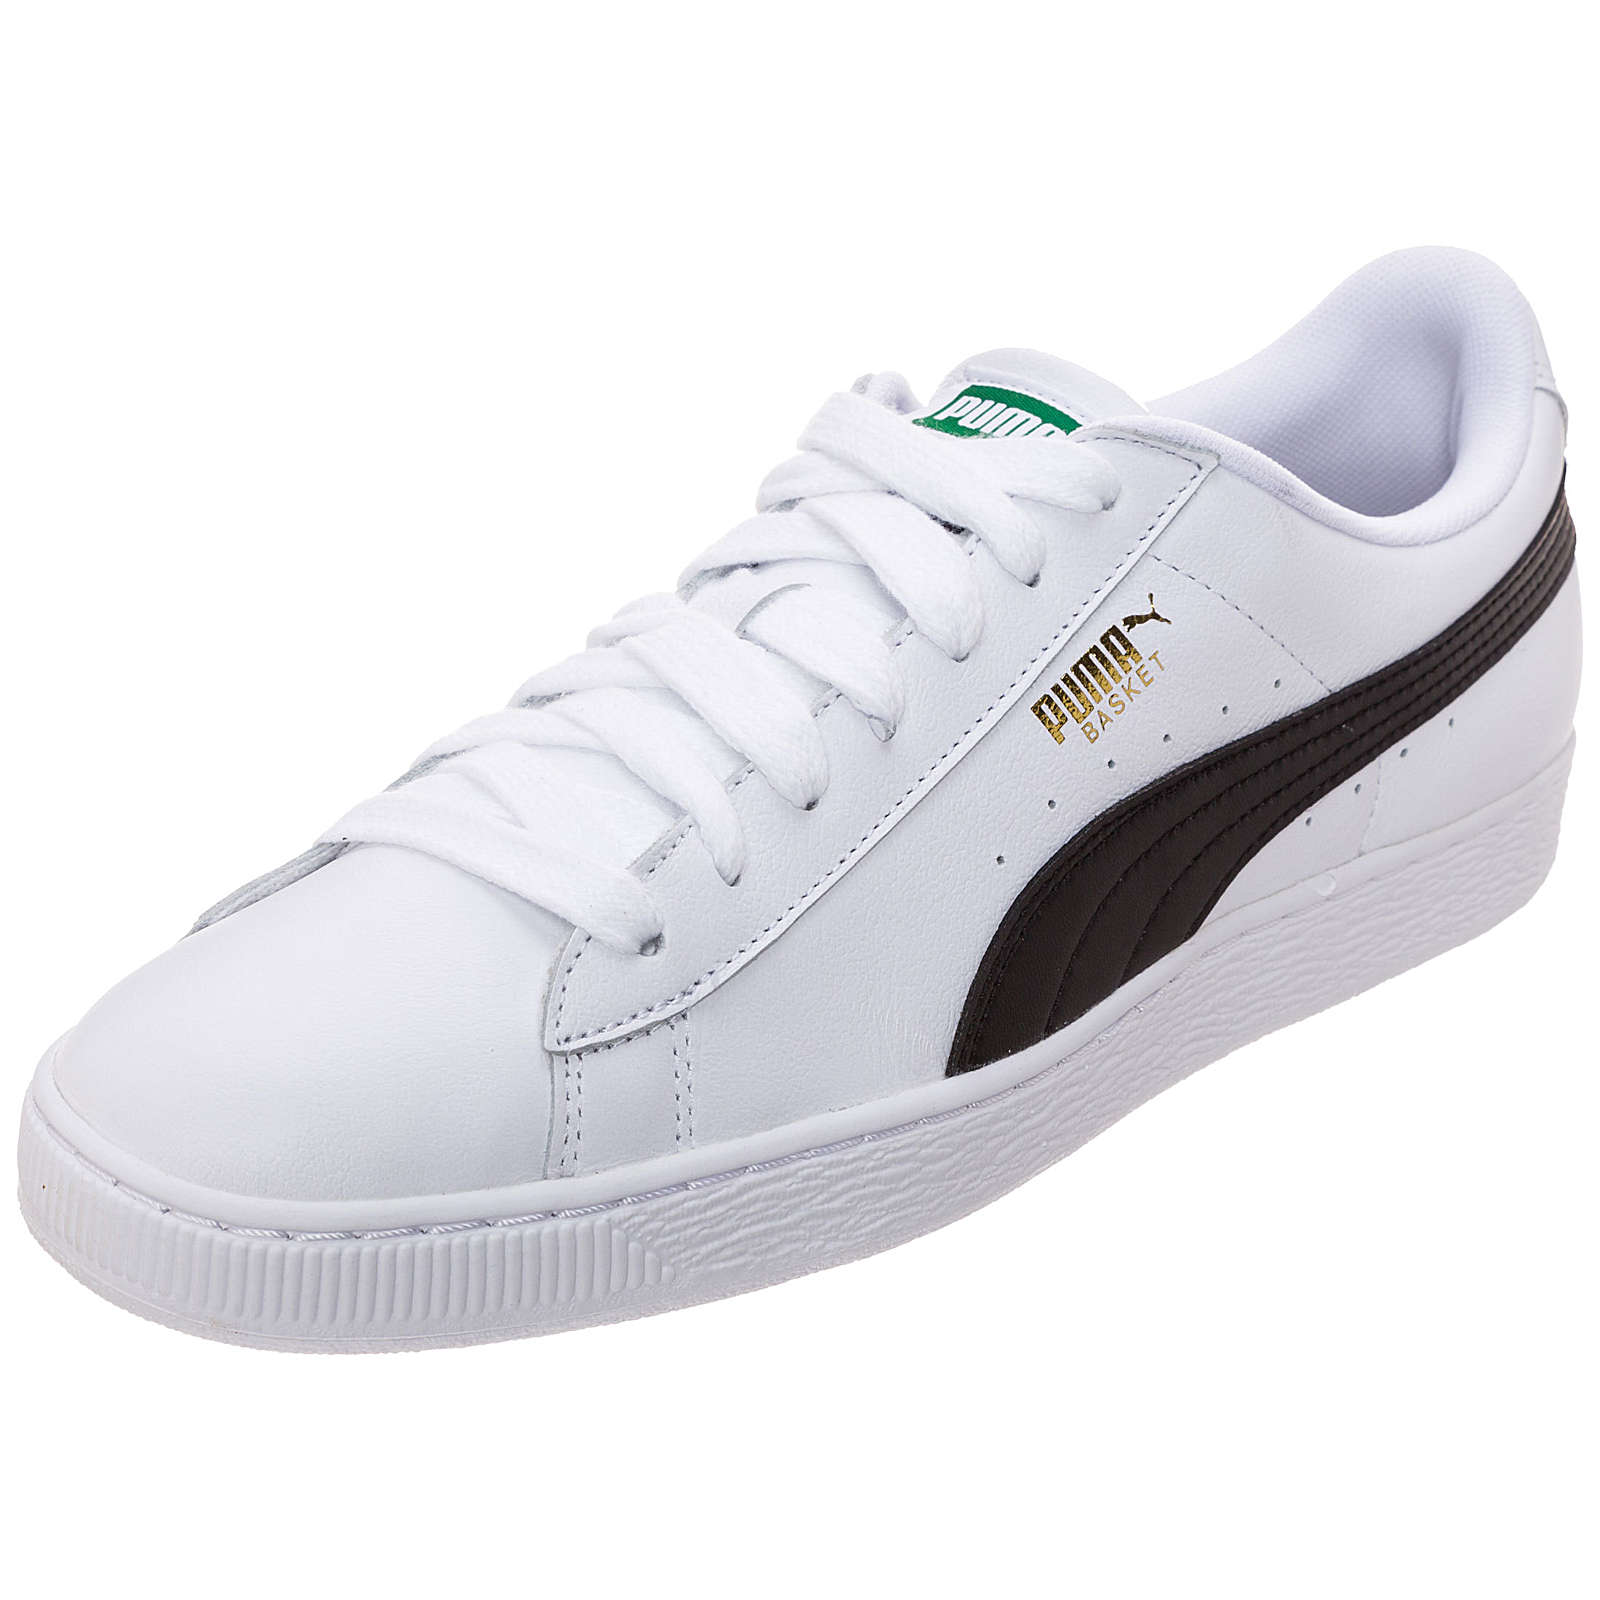 PUMA Sneakers Low Basket Classic LFS weiß Damen Gr. 42,5